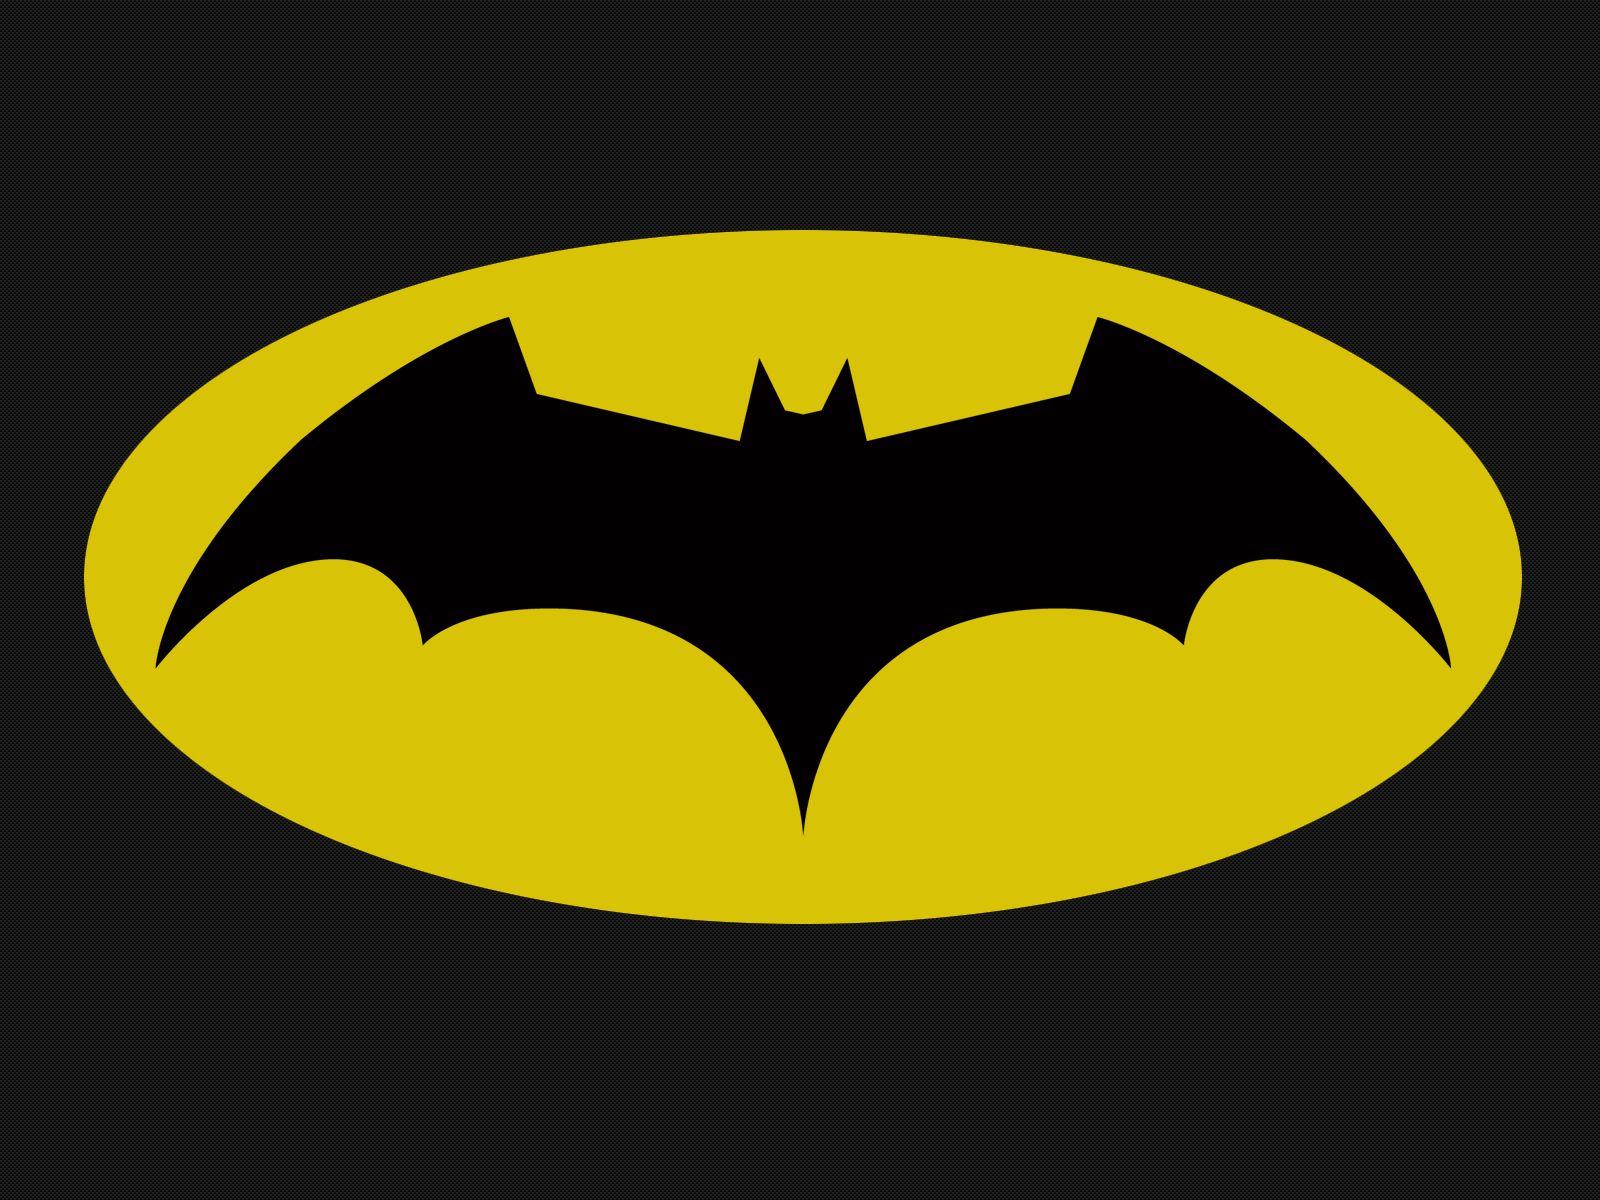 picture of batman logo Google Search supernatural 6